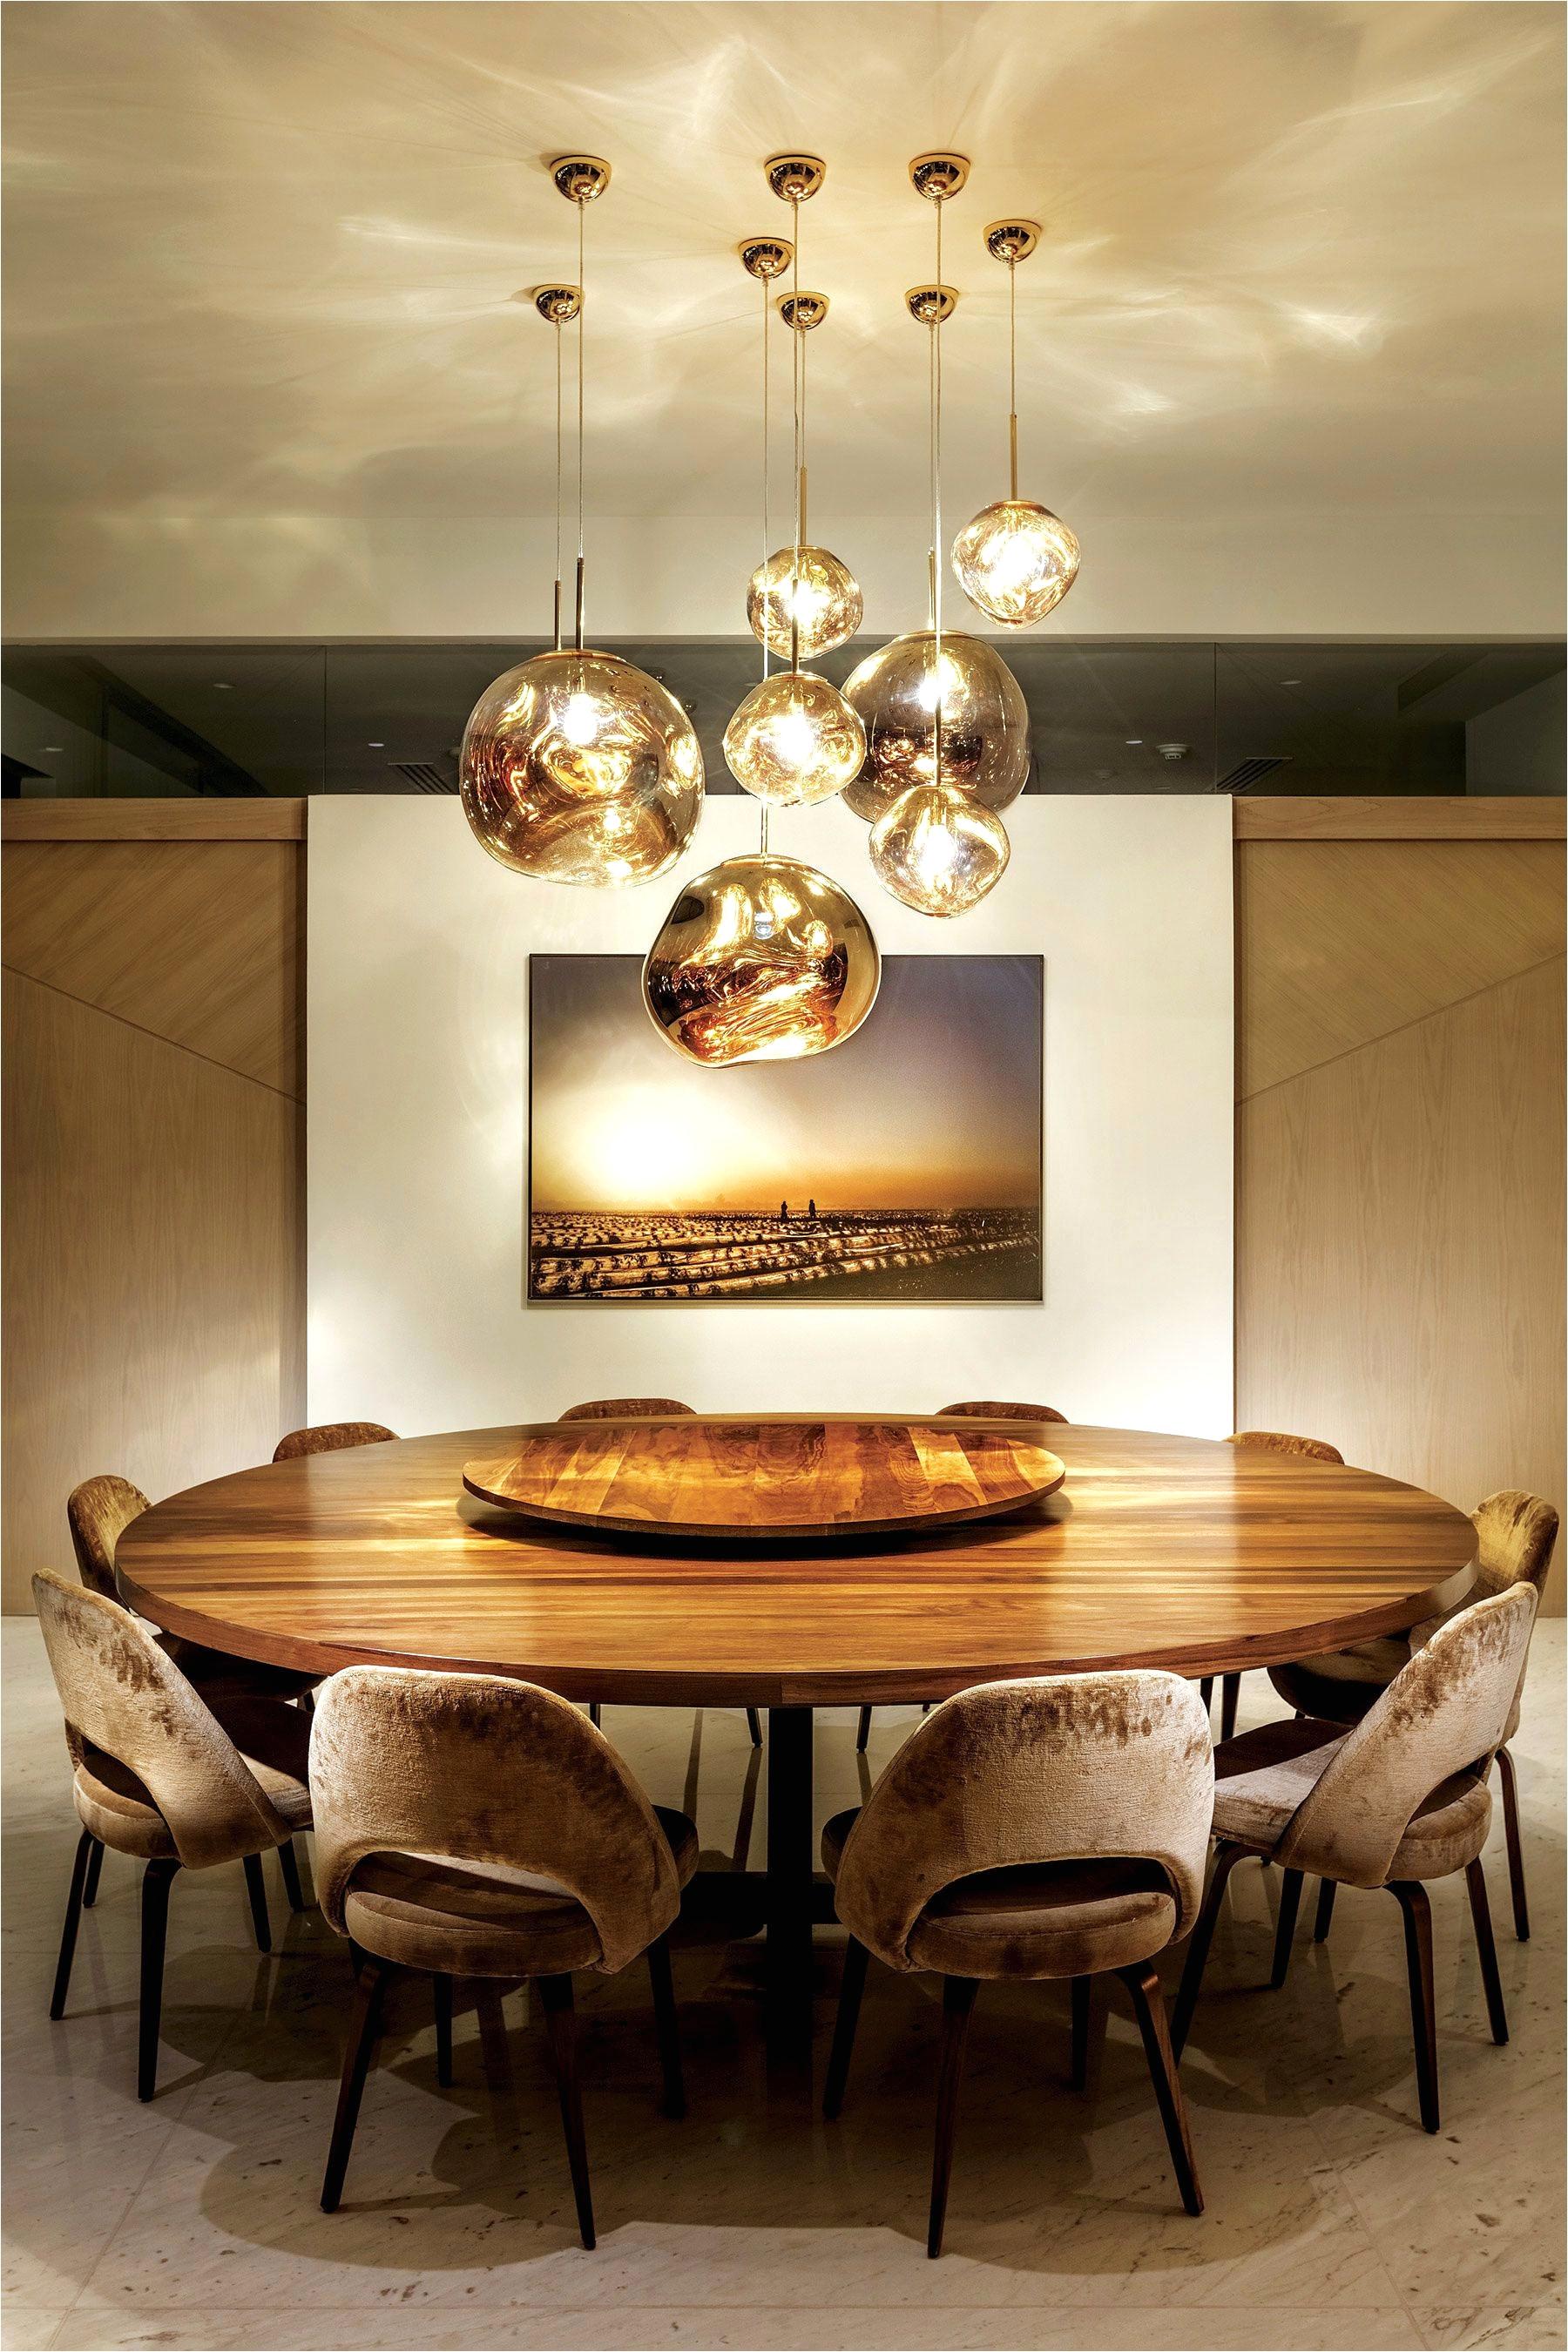 large foyer ideas fresh 29 entryway light ideas of 27 best of large foyer ideas